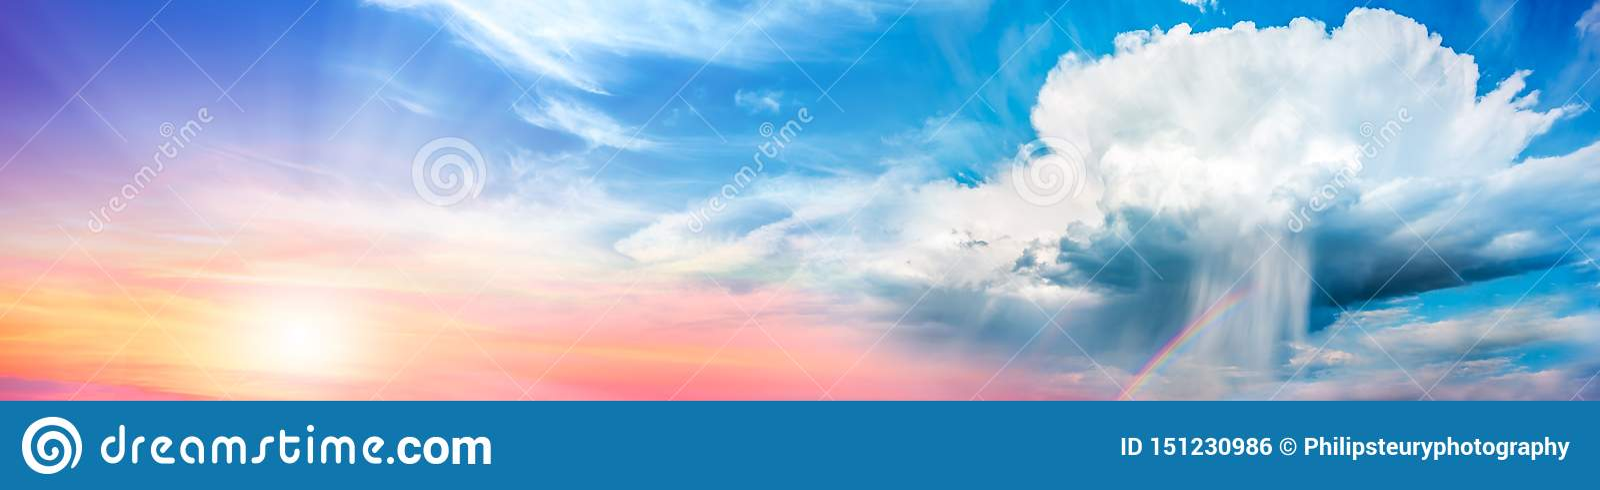 Hintergrund-Fahne von Cumulonimbus Supercell